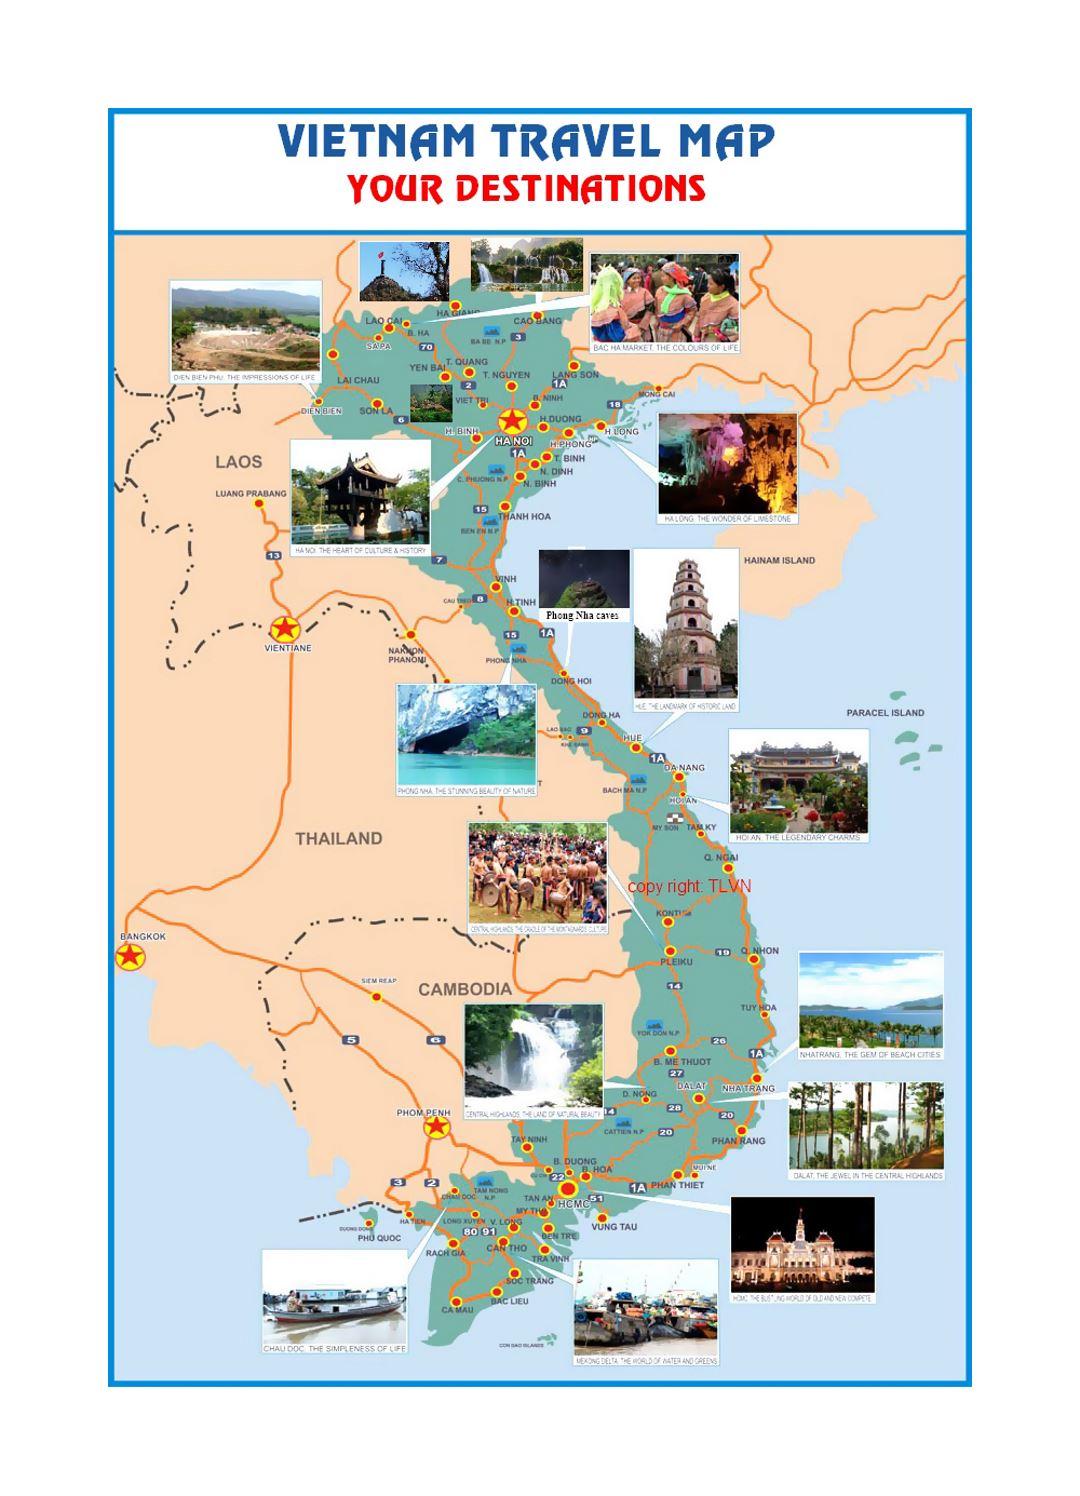 Travel Map Of Vietnam Vietnam Asia Mapsland Maps Of The World - Vietnam map